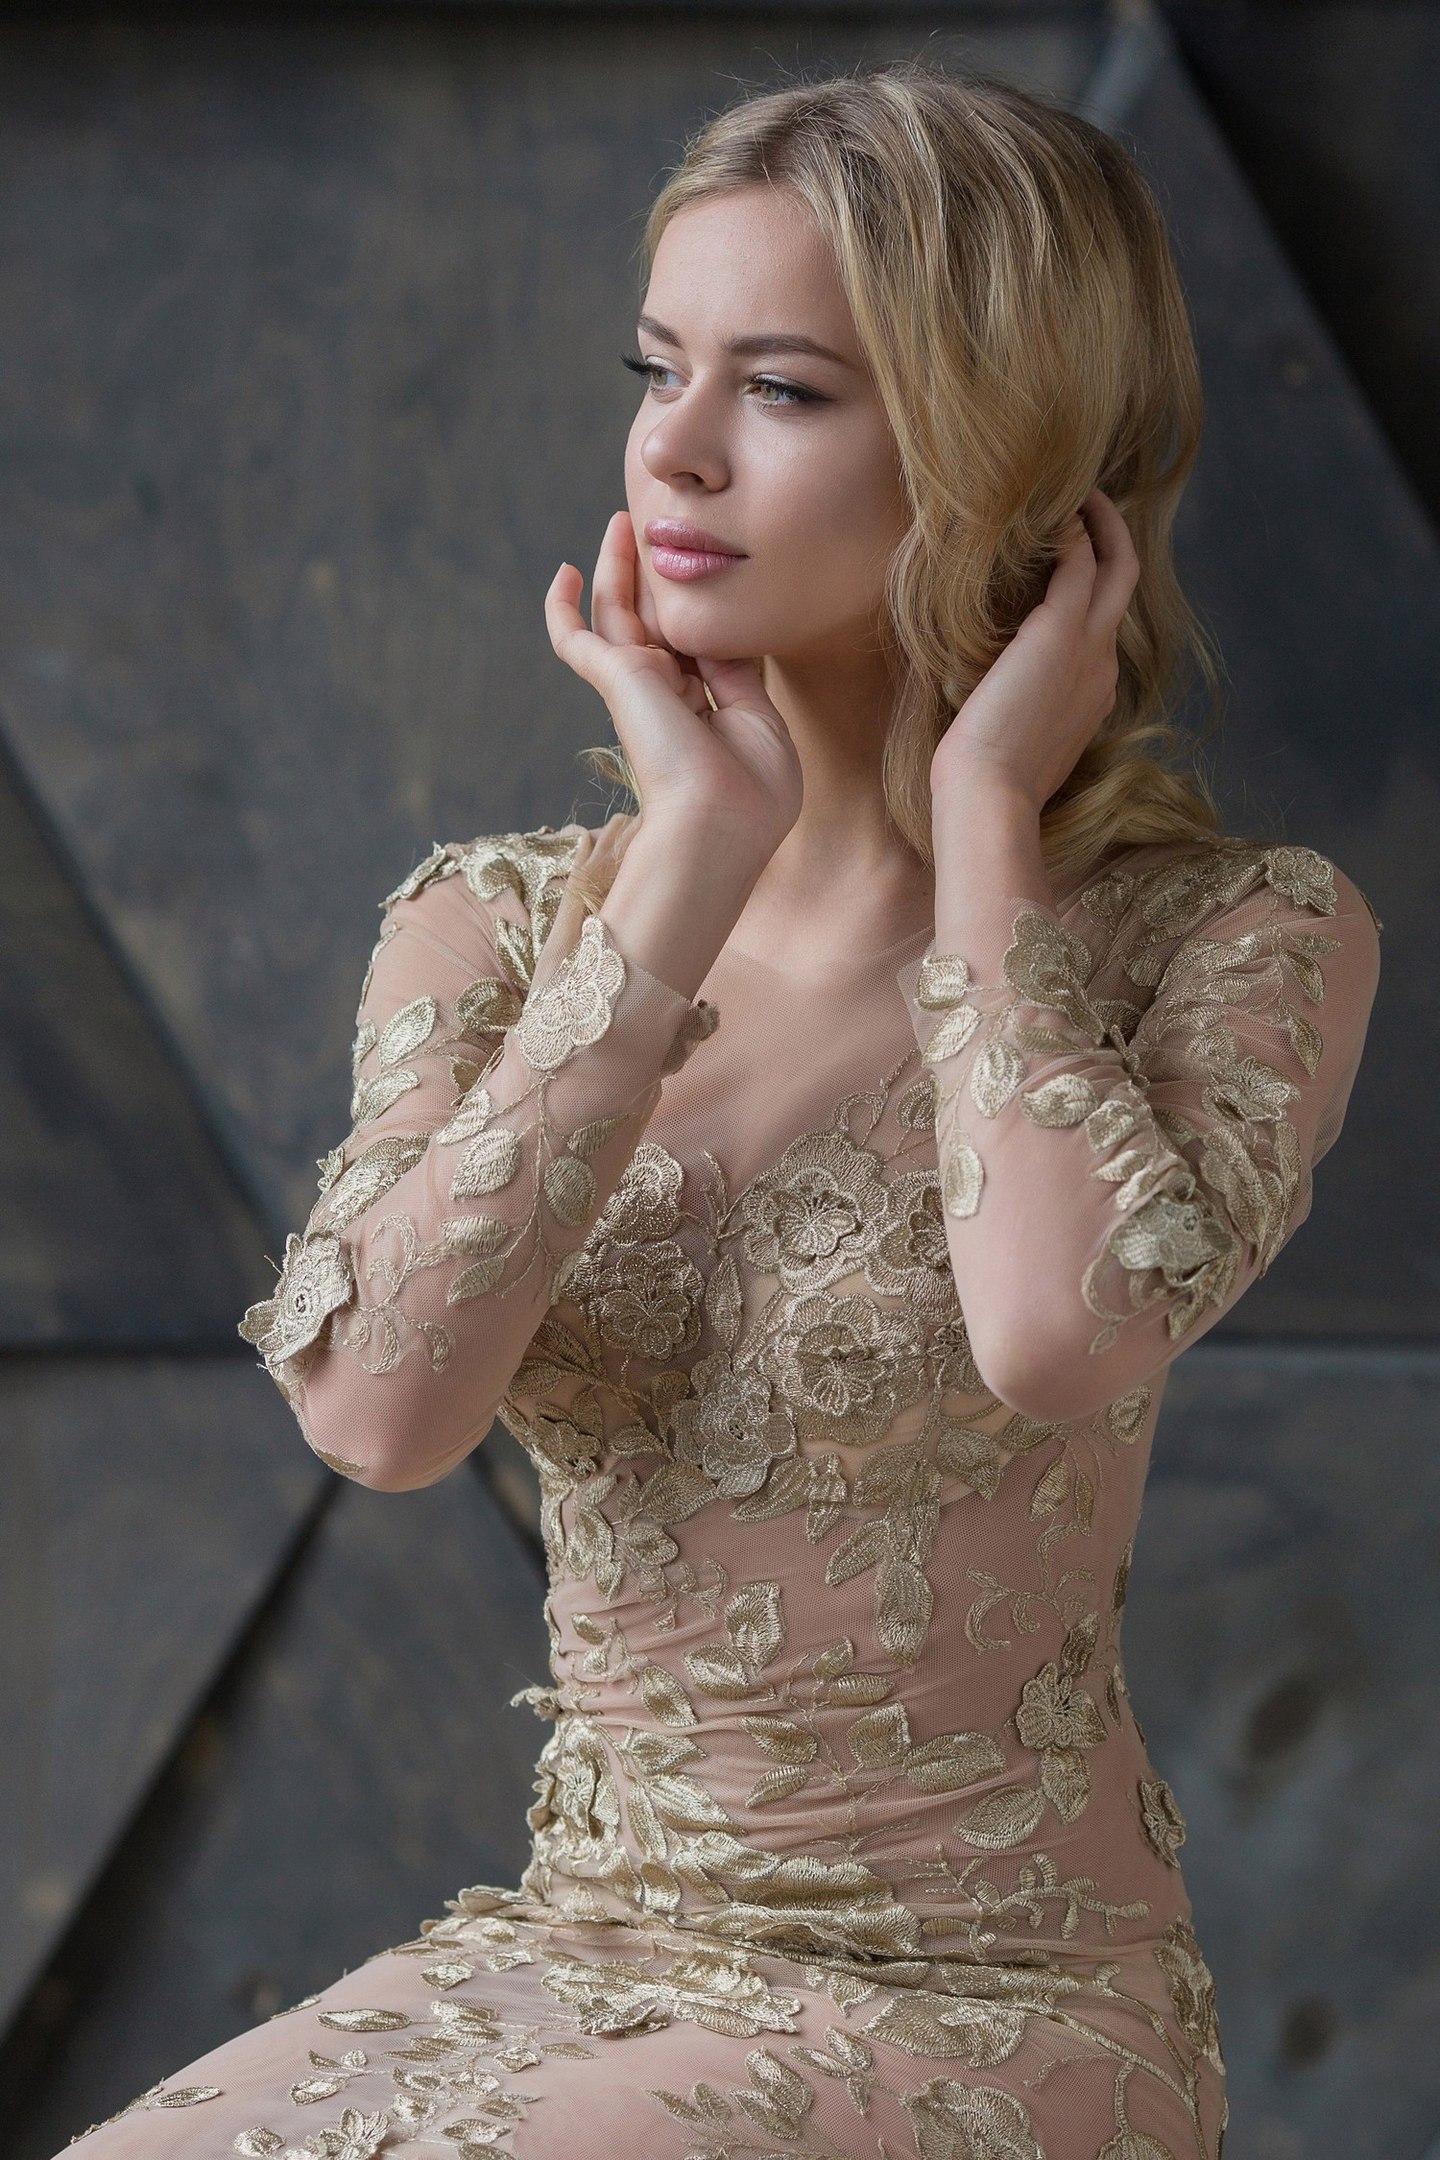 Анна Погорилая-2 WAZuhtokEdg